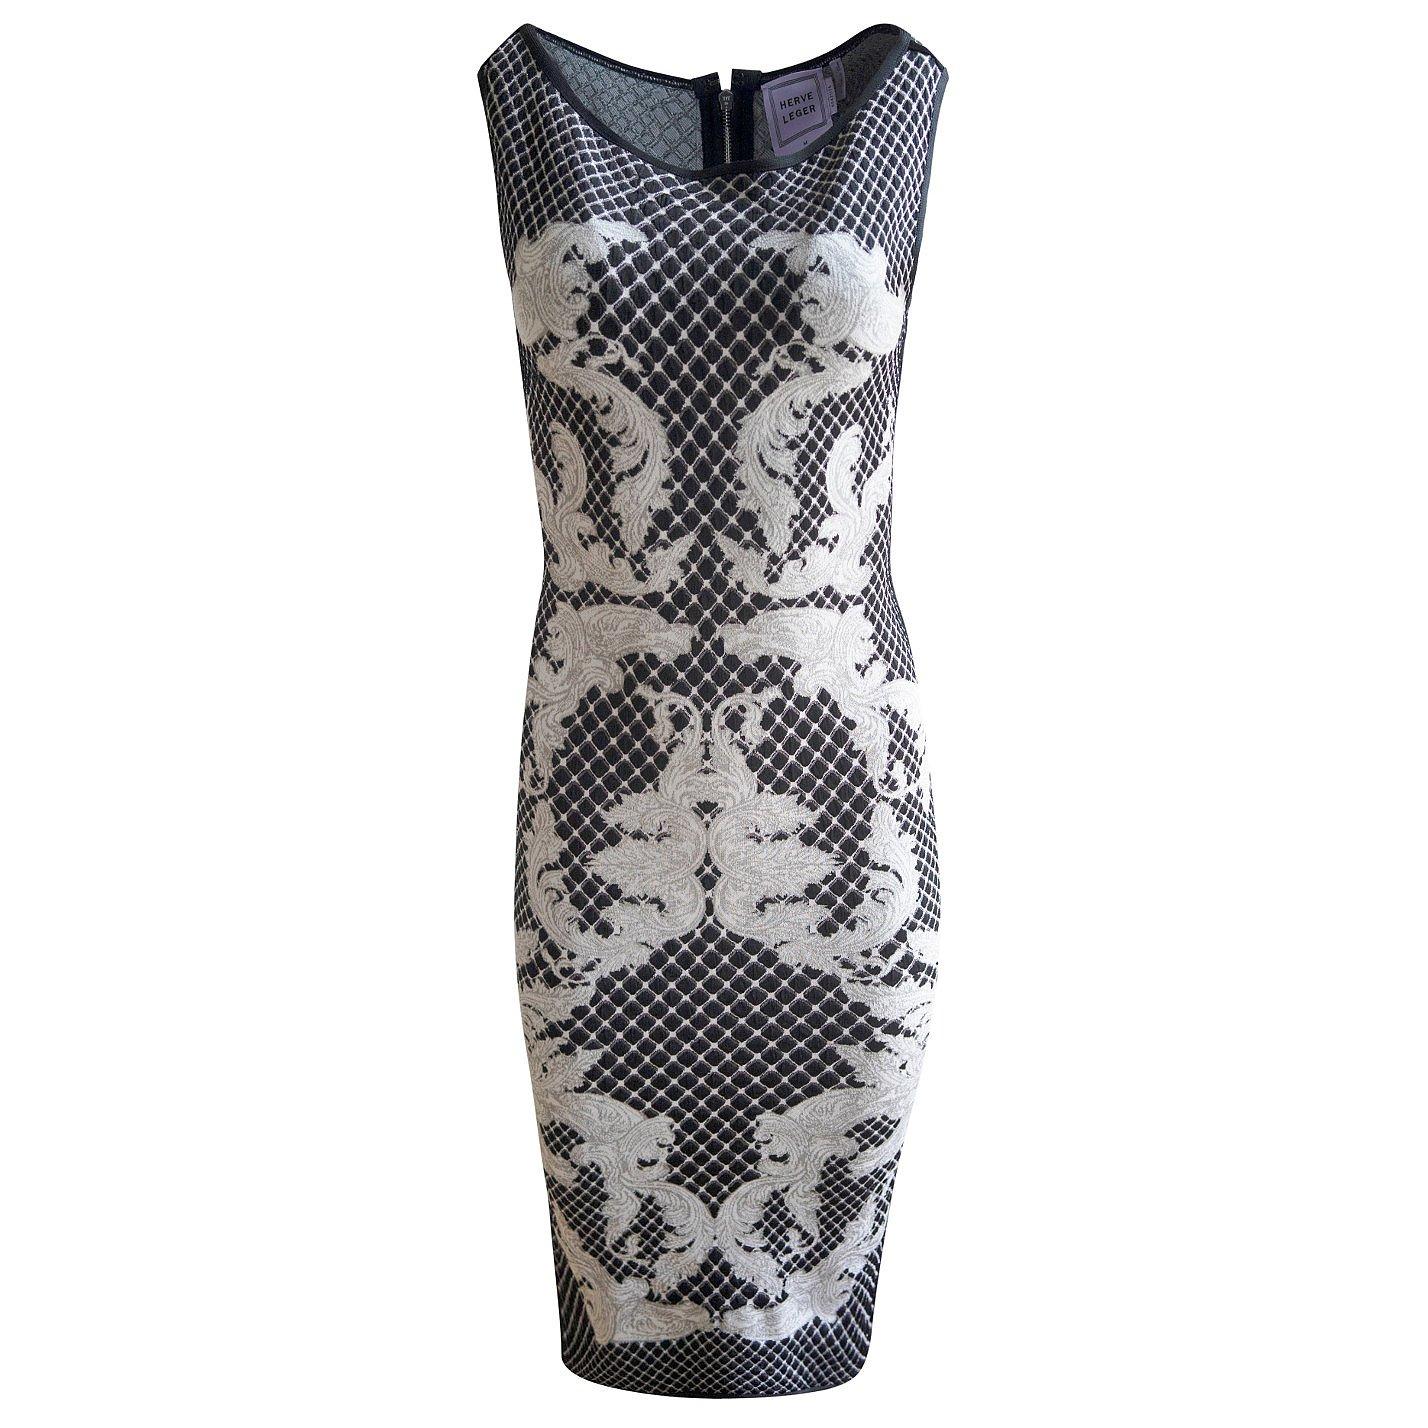 Herve Leger Patterned Knit Dress